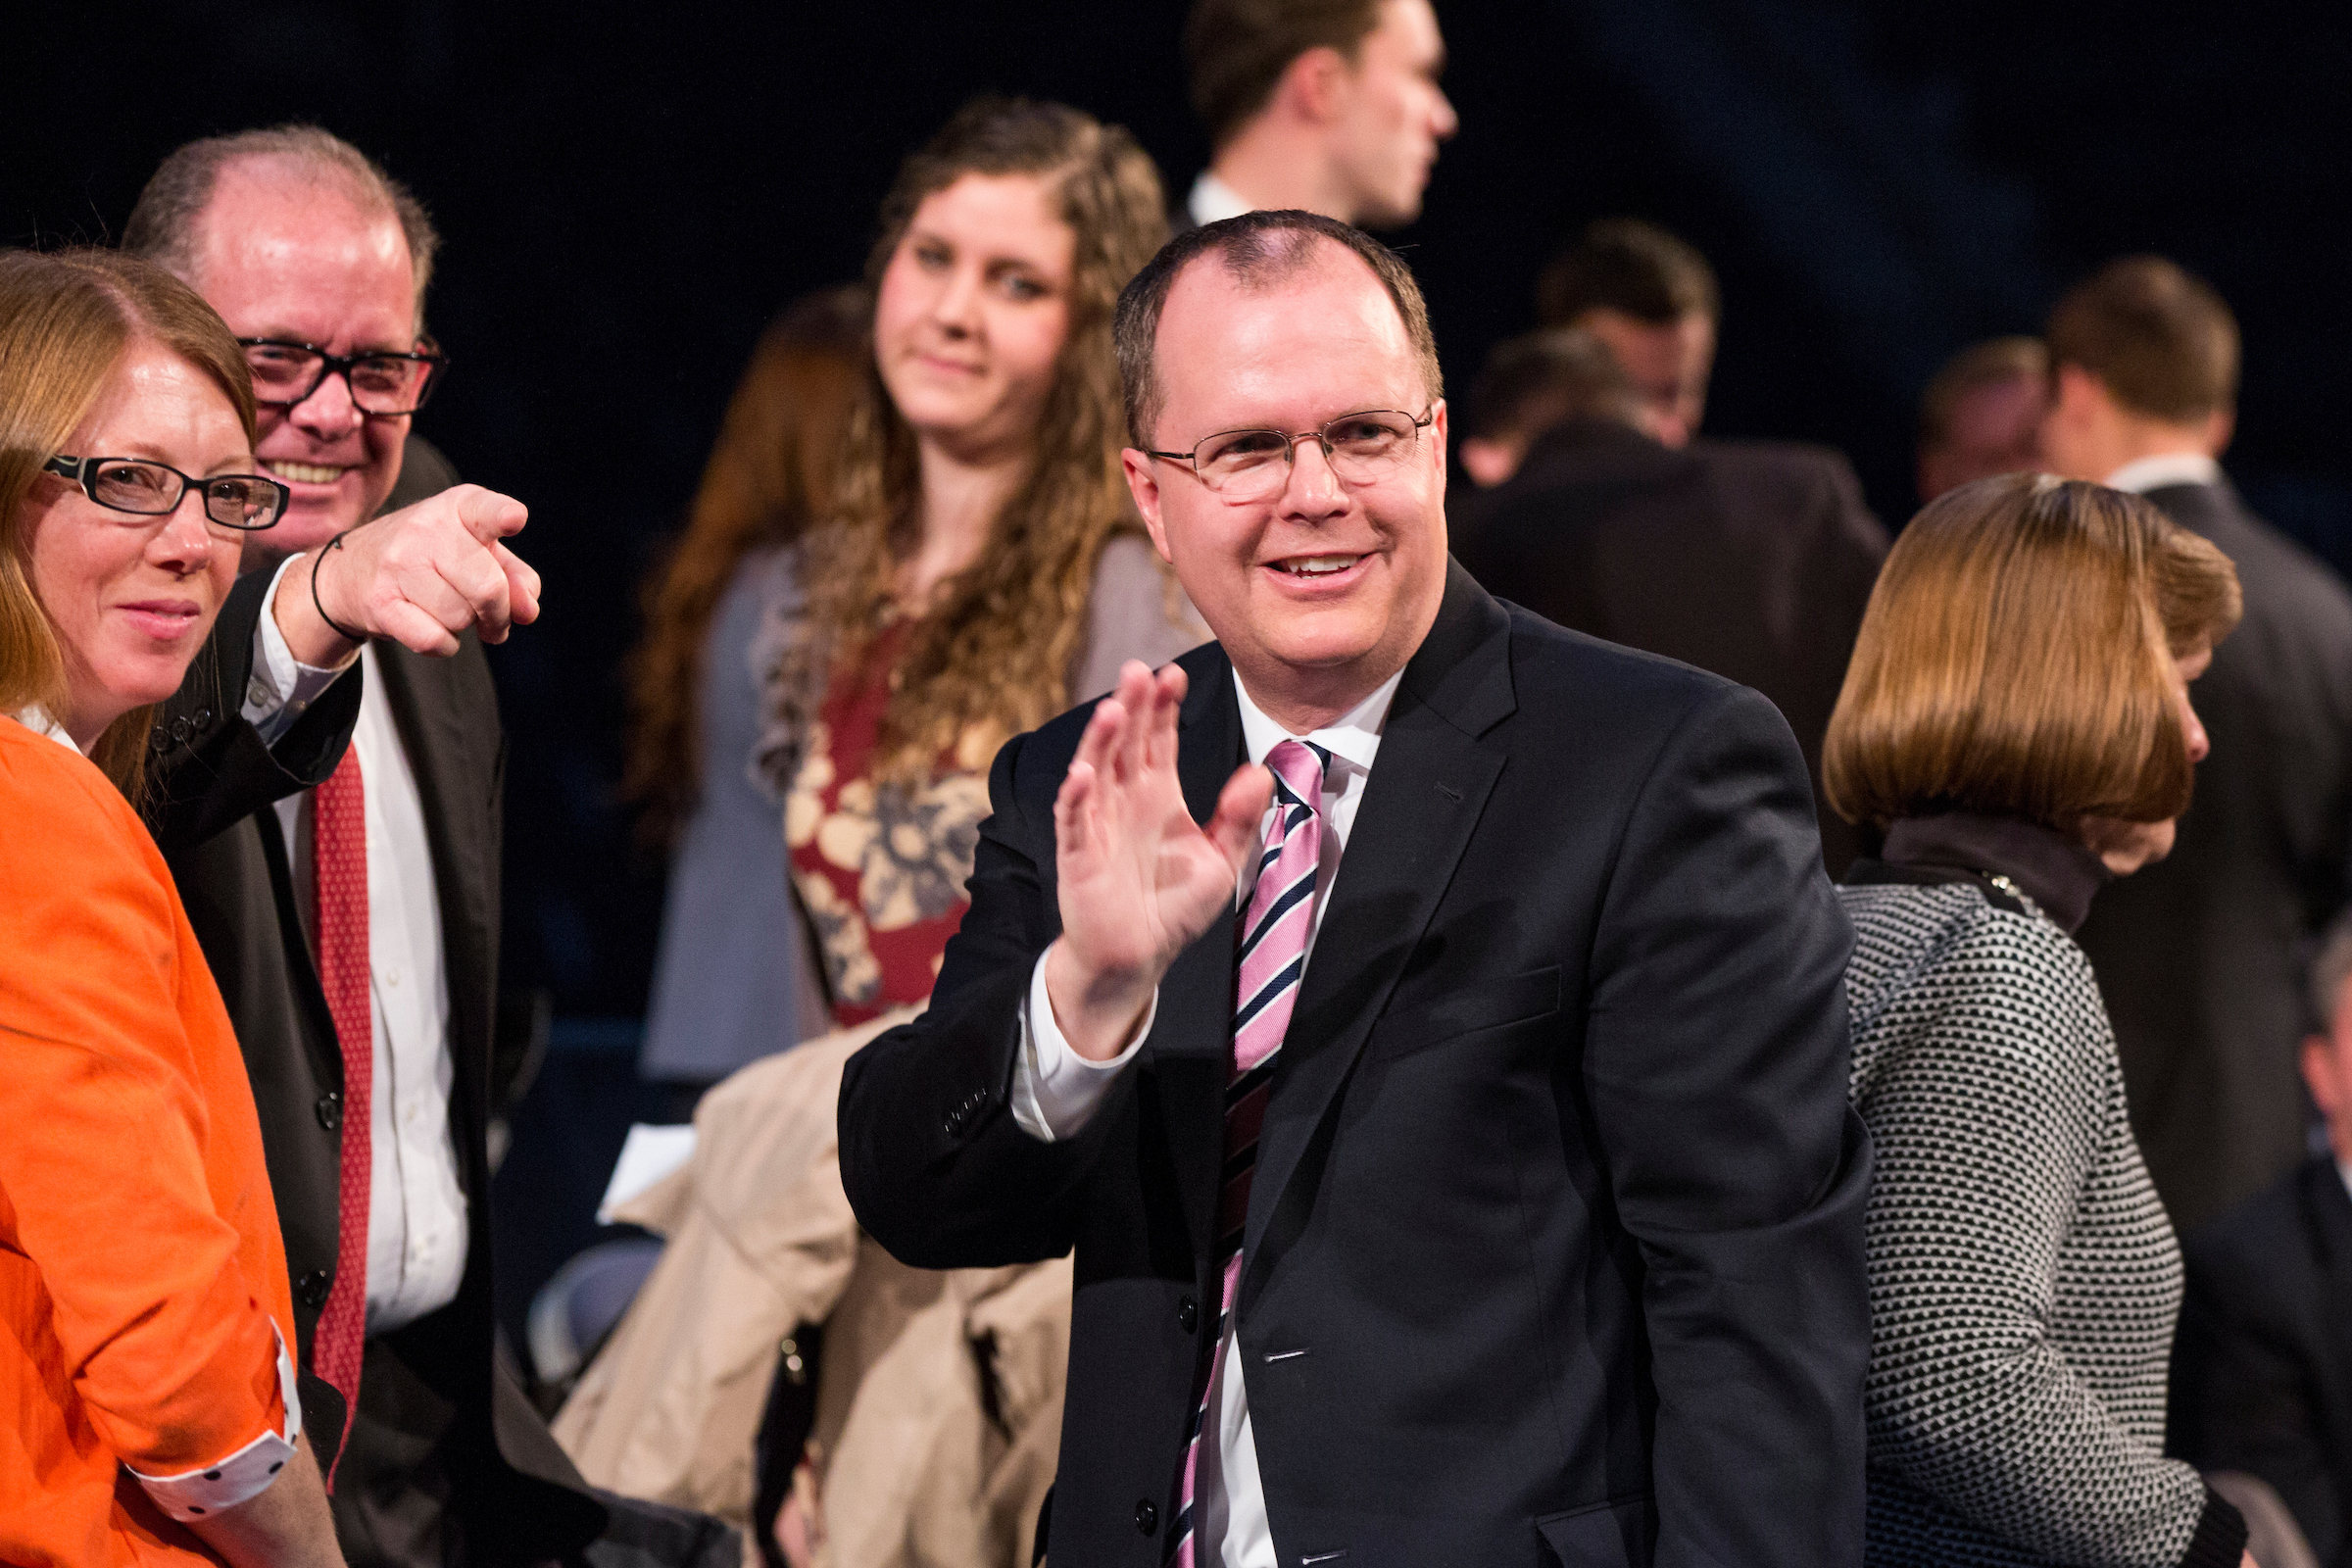 Brian K. Ashton waves after delivering a BYU devotional in Provo, Utah, in December 2017.